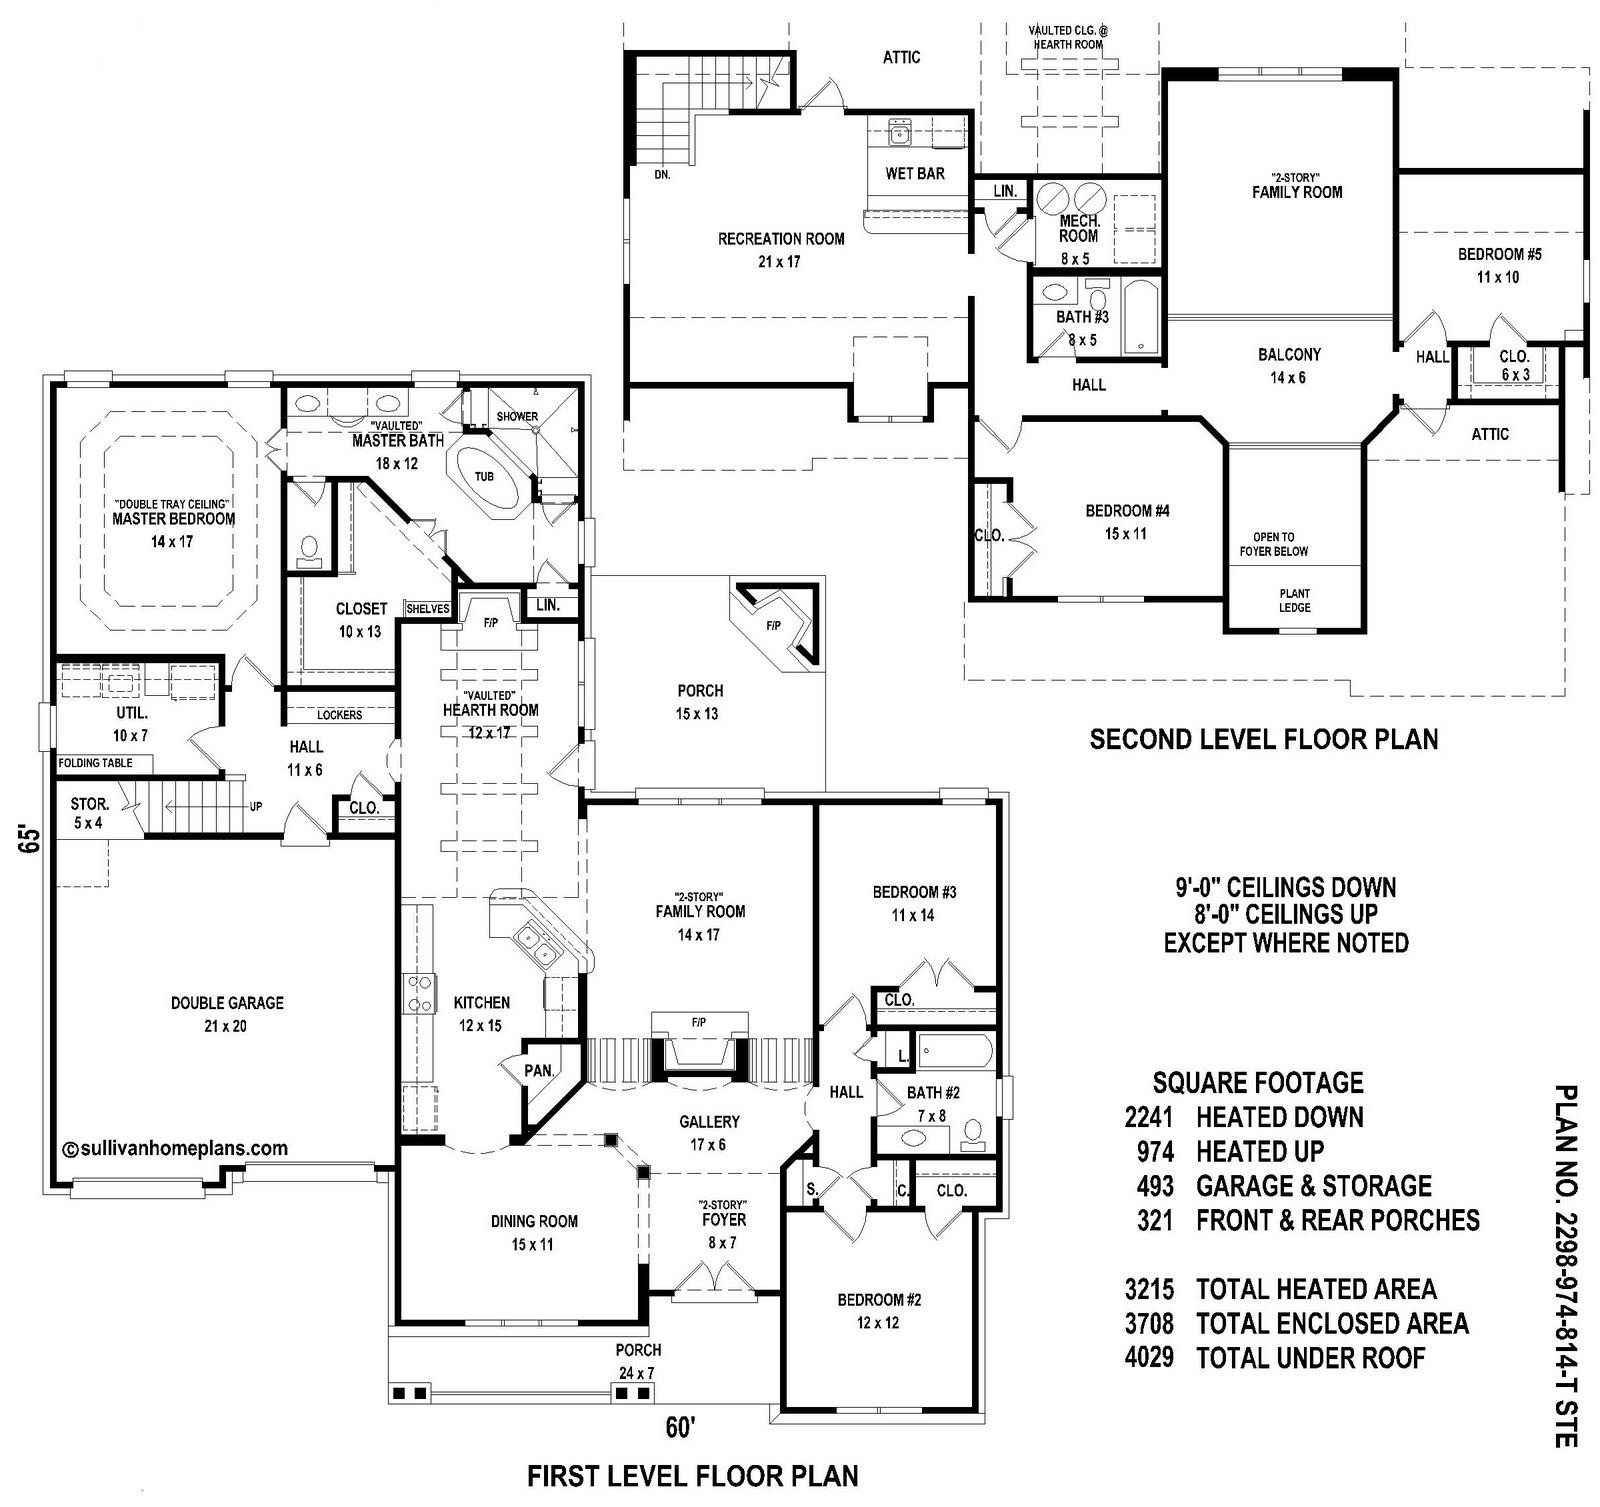 Sullivan Home Plans: June 2010